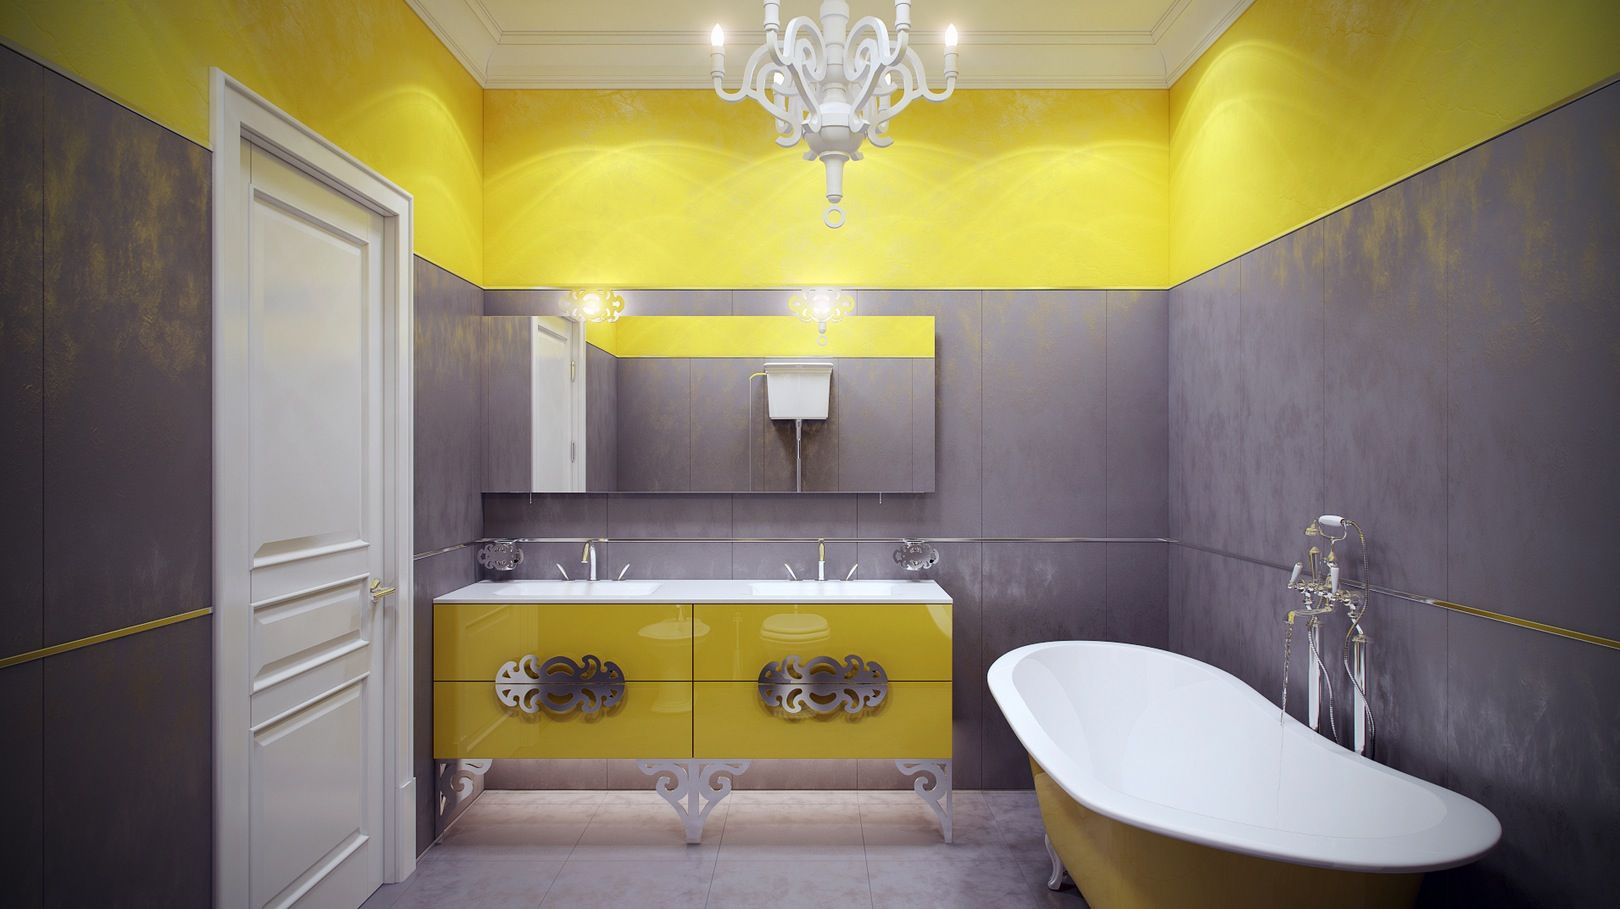 yellow bathroom decor | Powerful and Pretty Yellow Bathroom Design ...